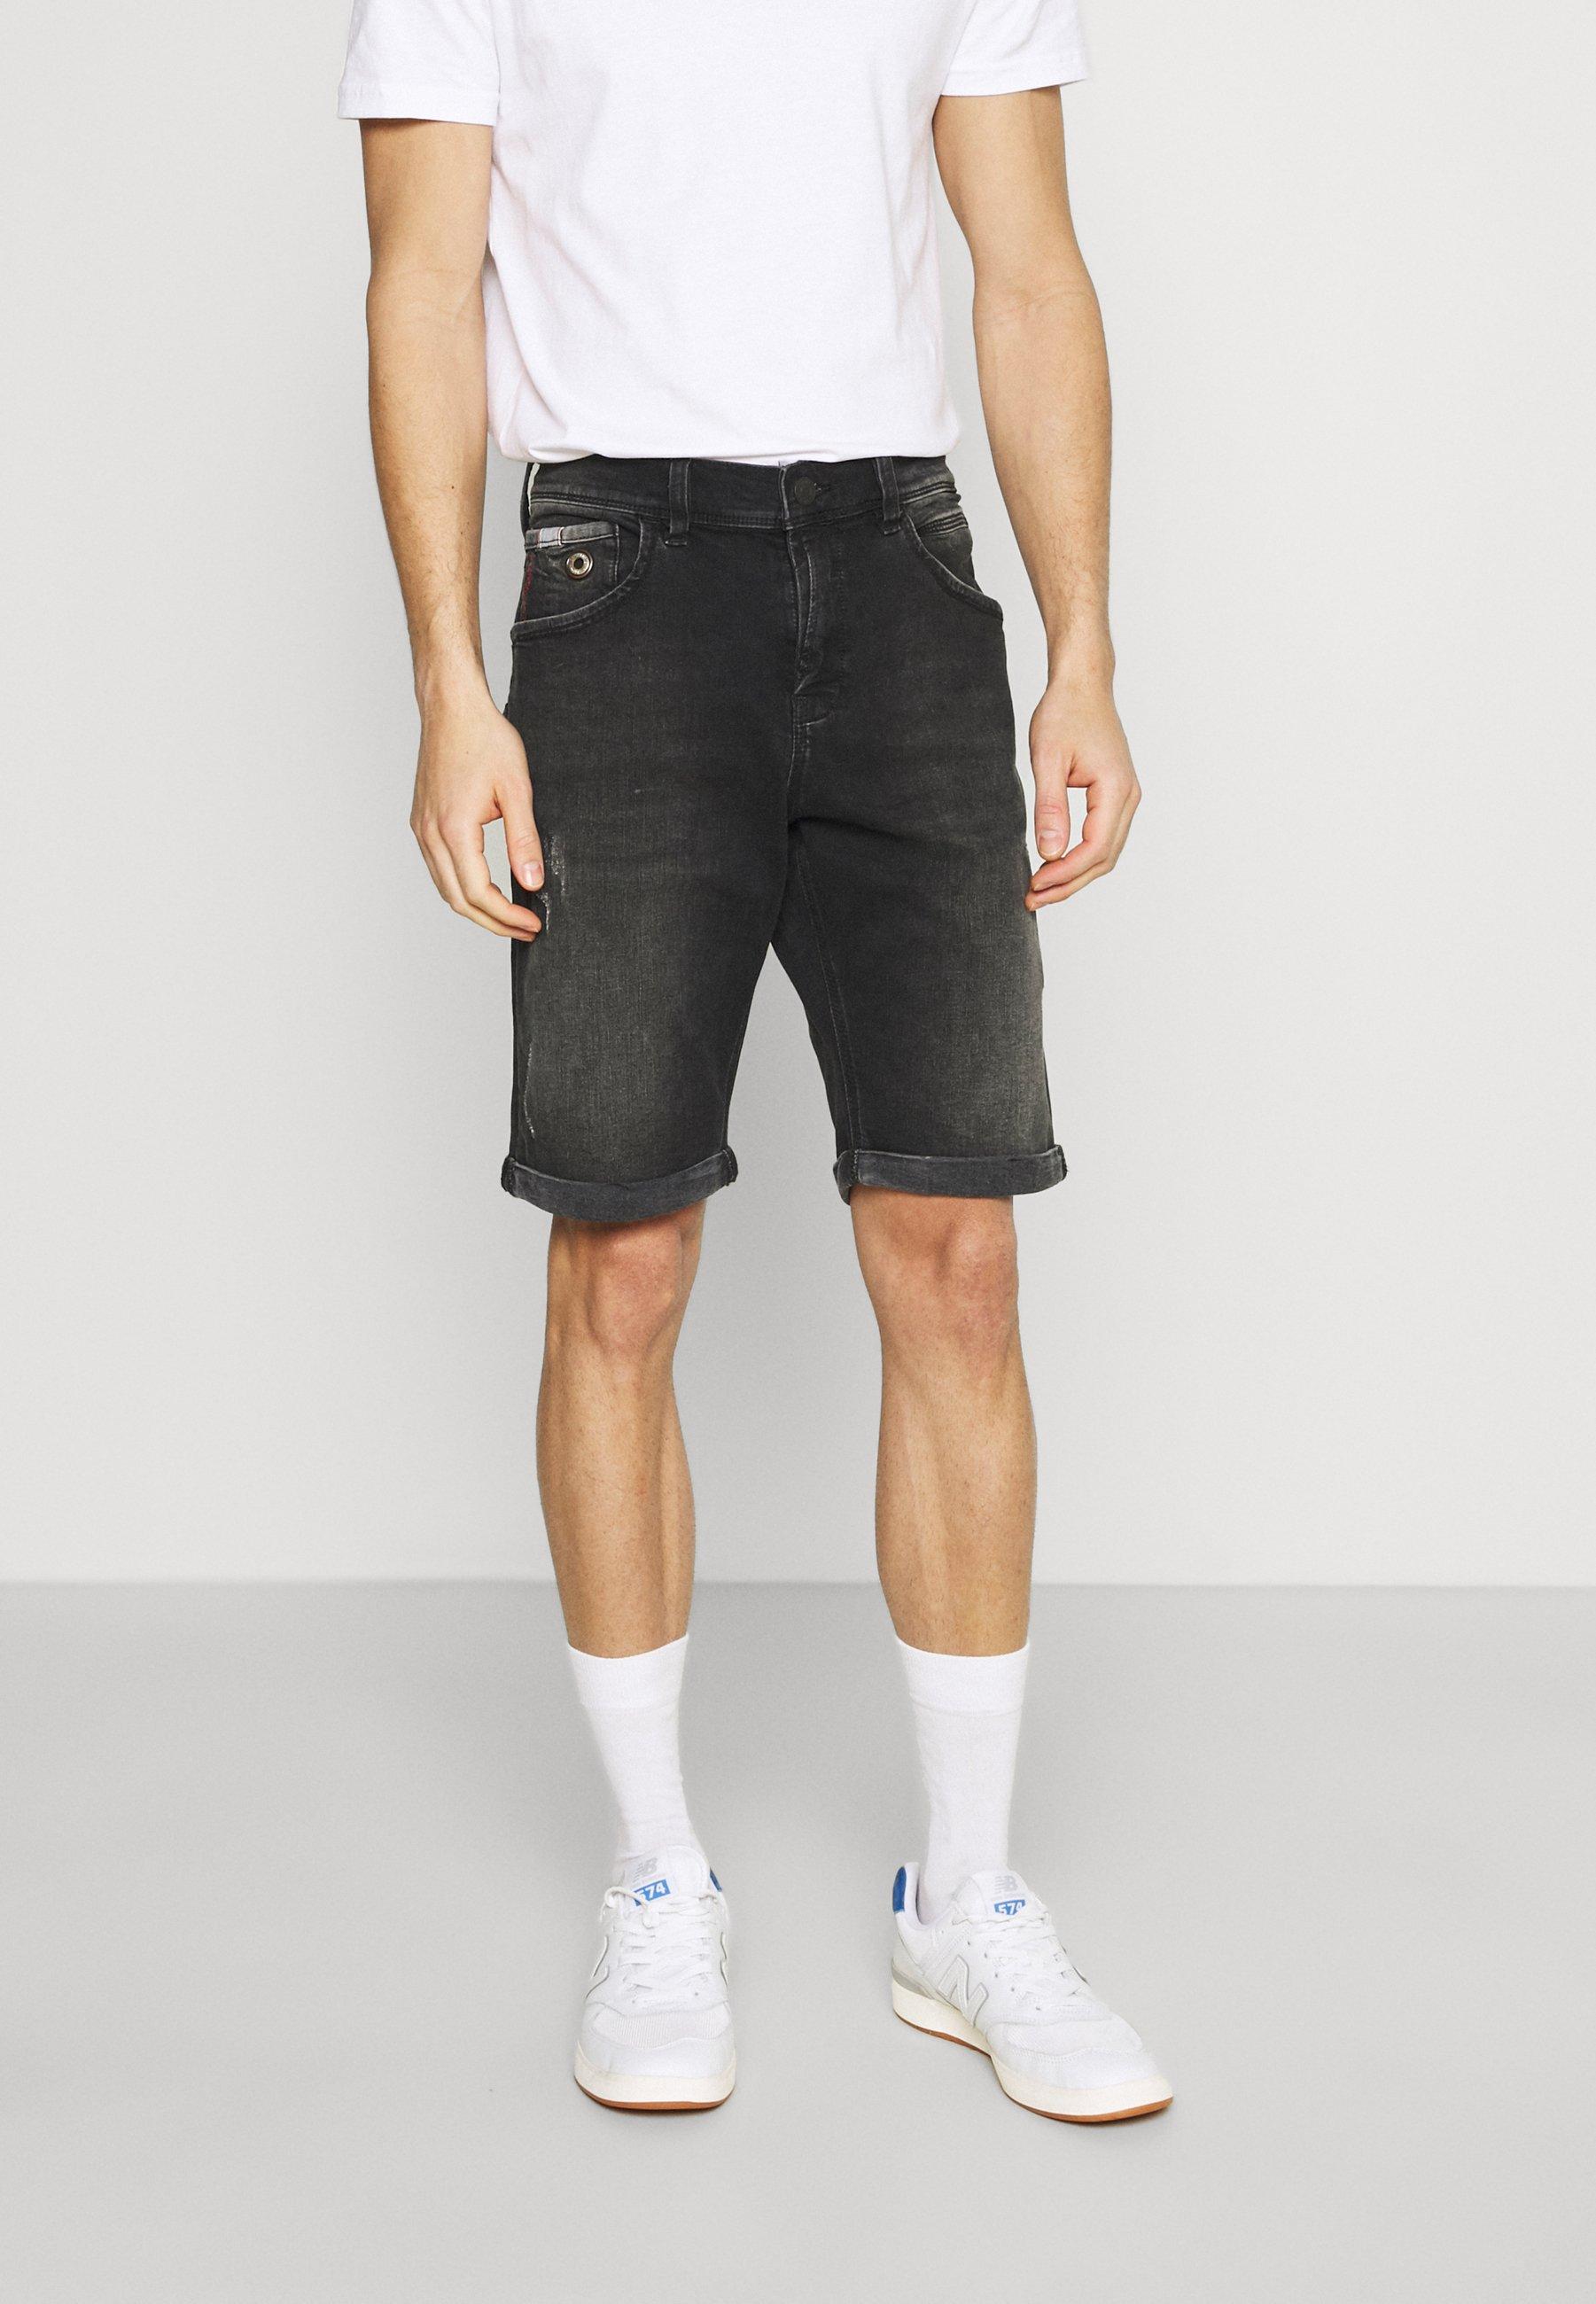 Homme LANCE - Short en jean